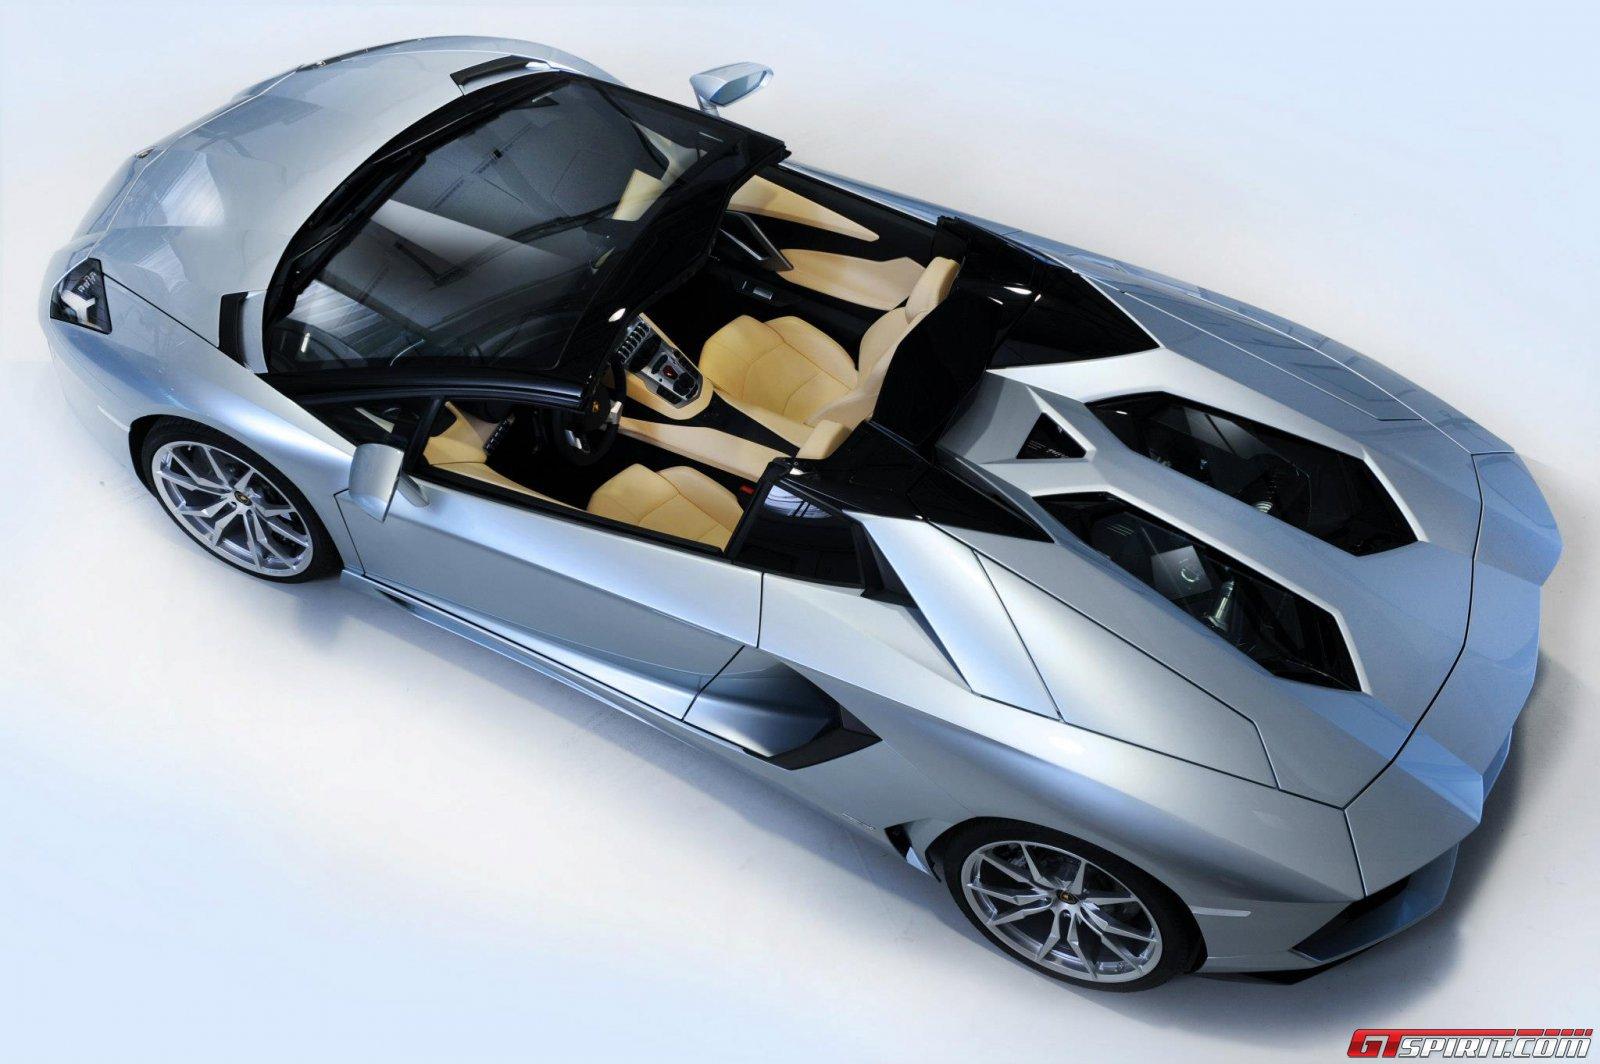 2013 Lamborghini Aventador LP700-4 Roadster Photo 23